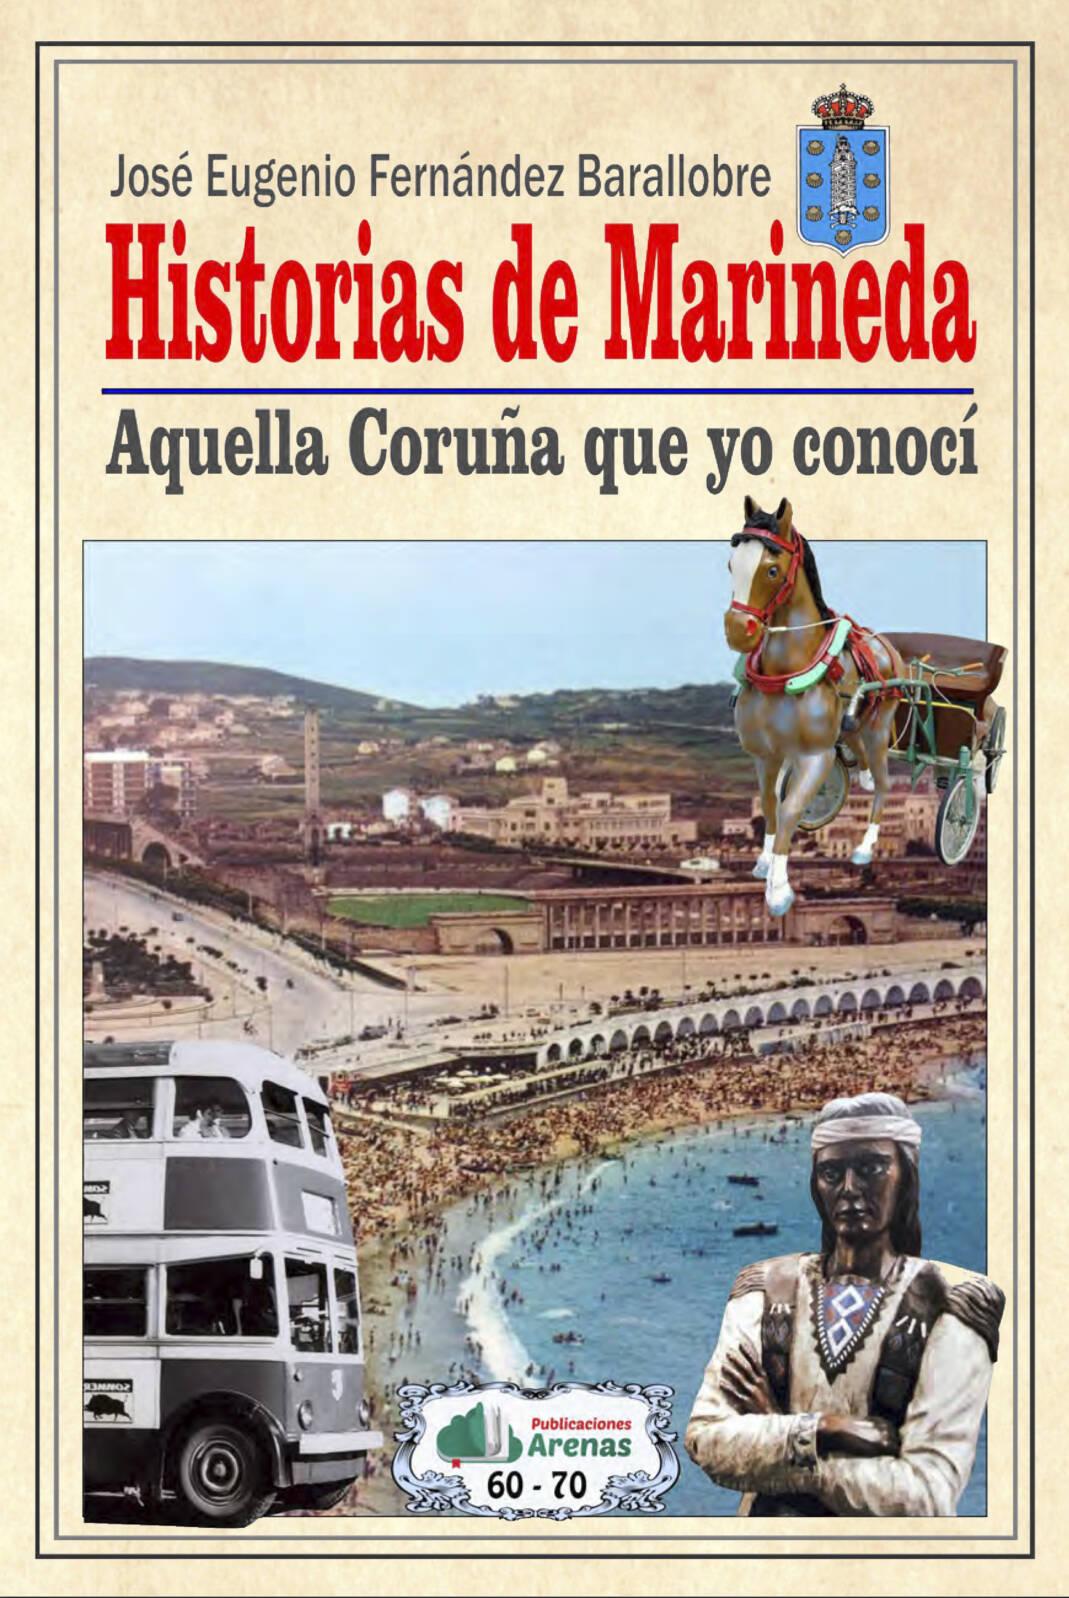 PORTADA-en-baja-HISTORIAS-DE-MARINEDA-e1617317610938.jpg